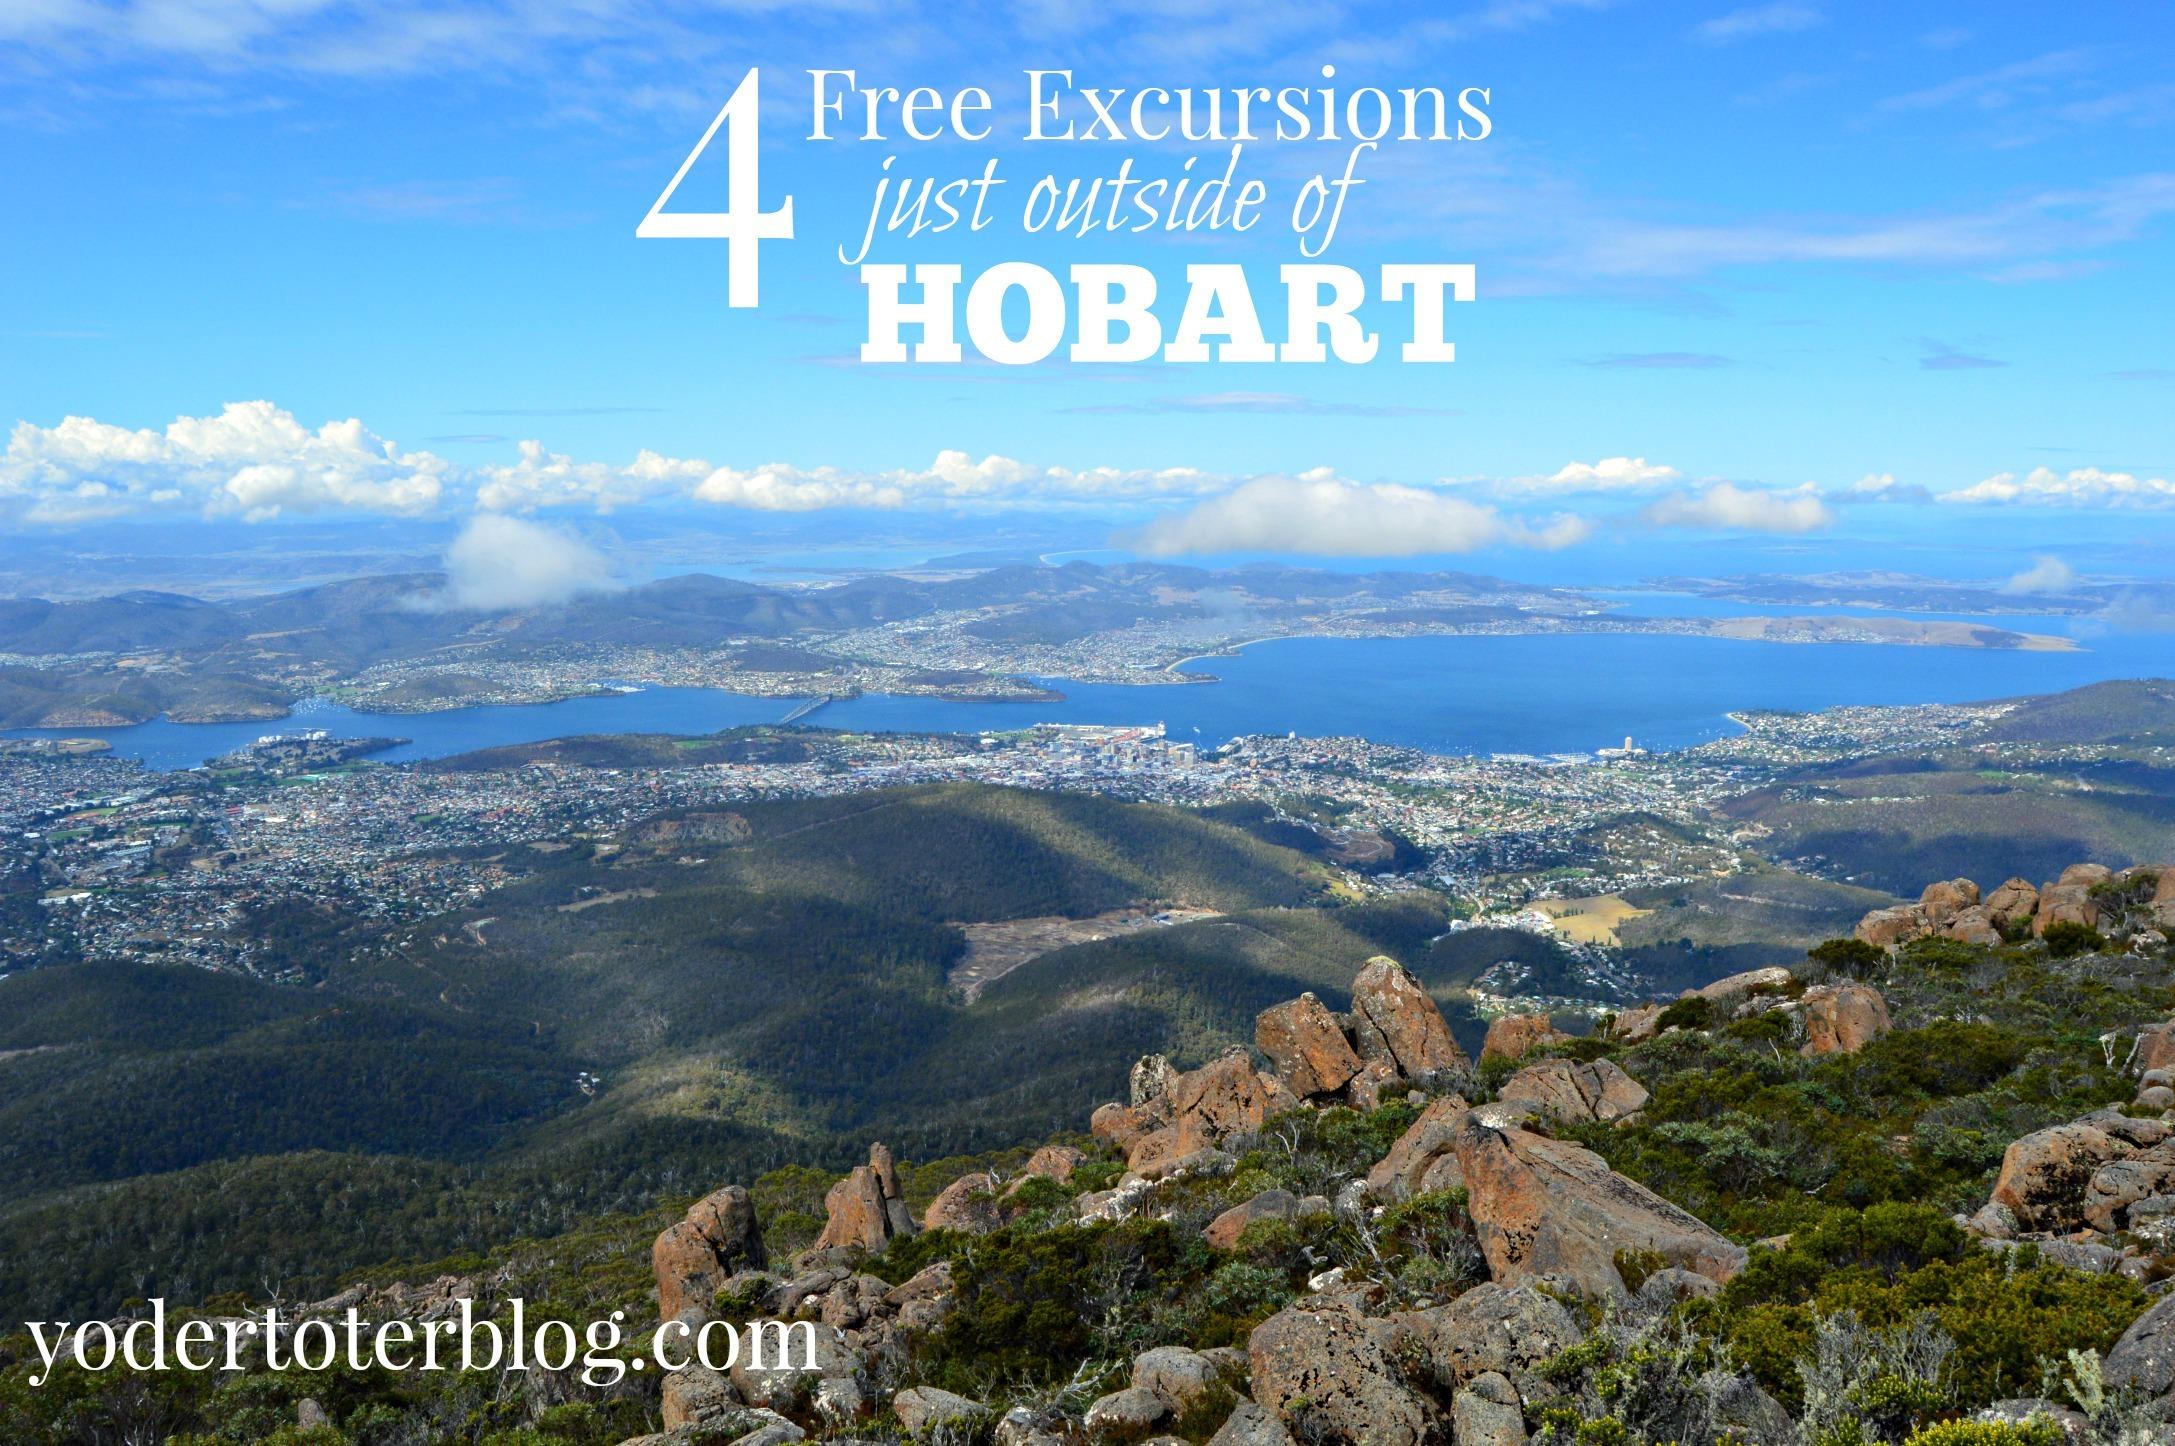 hobart exc header